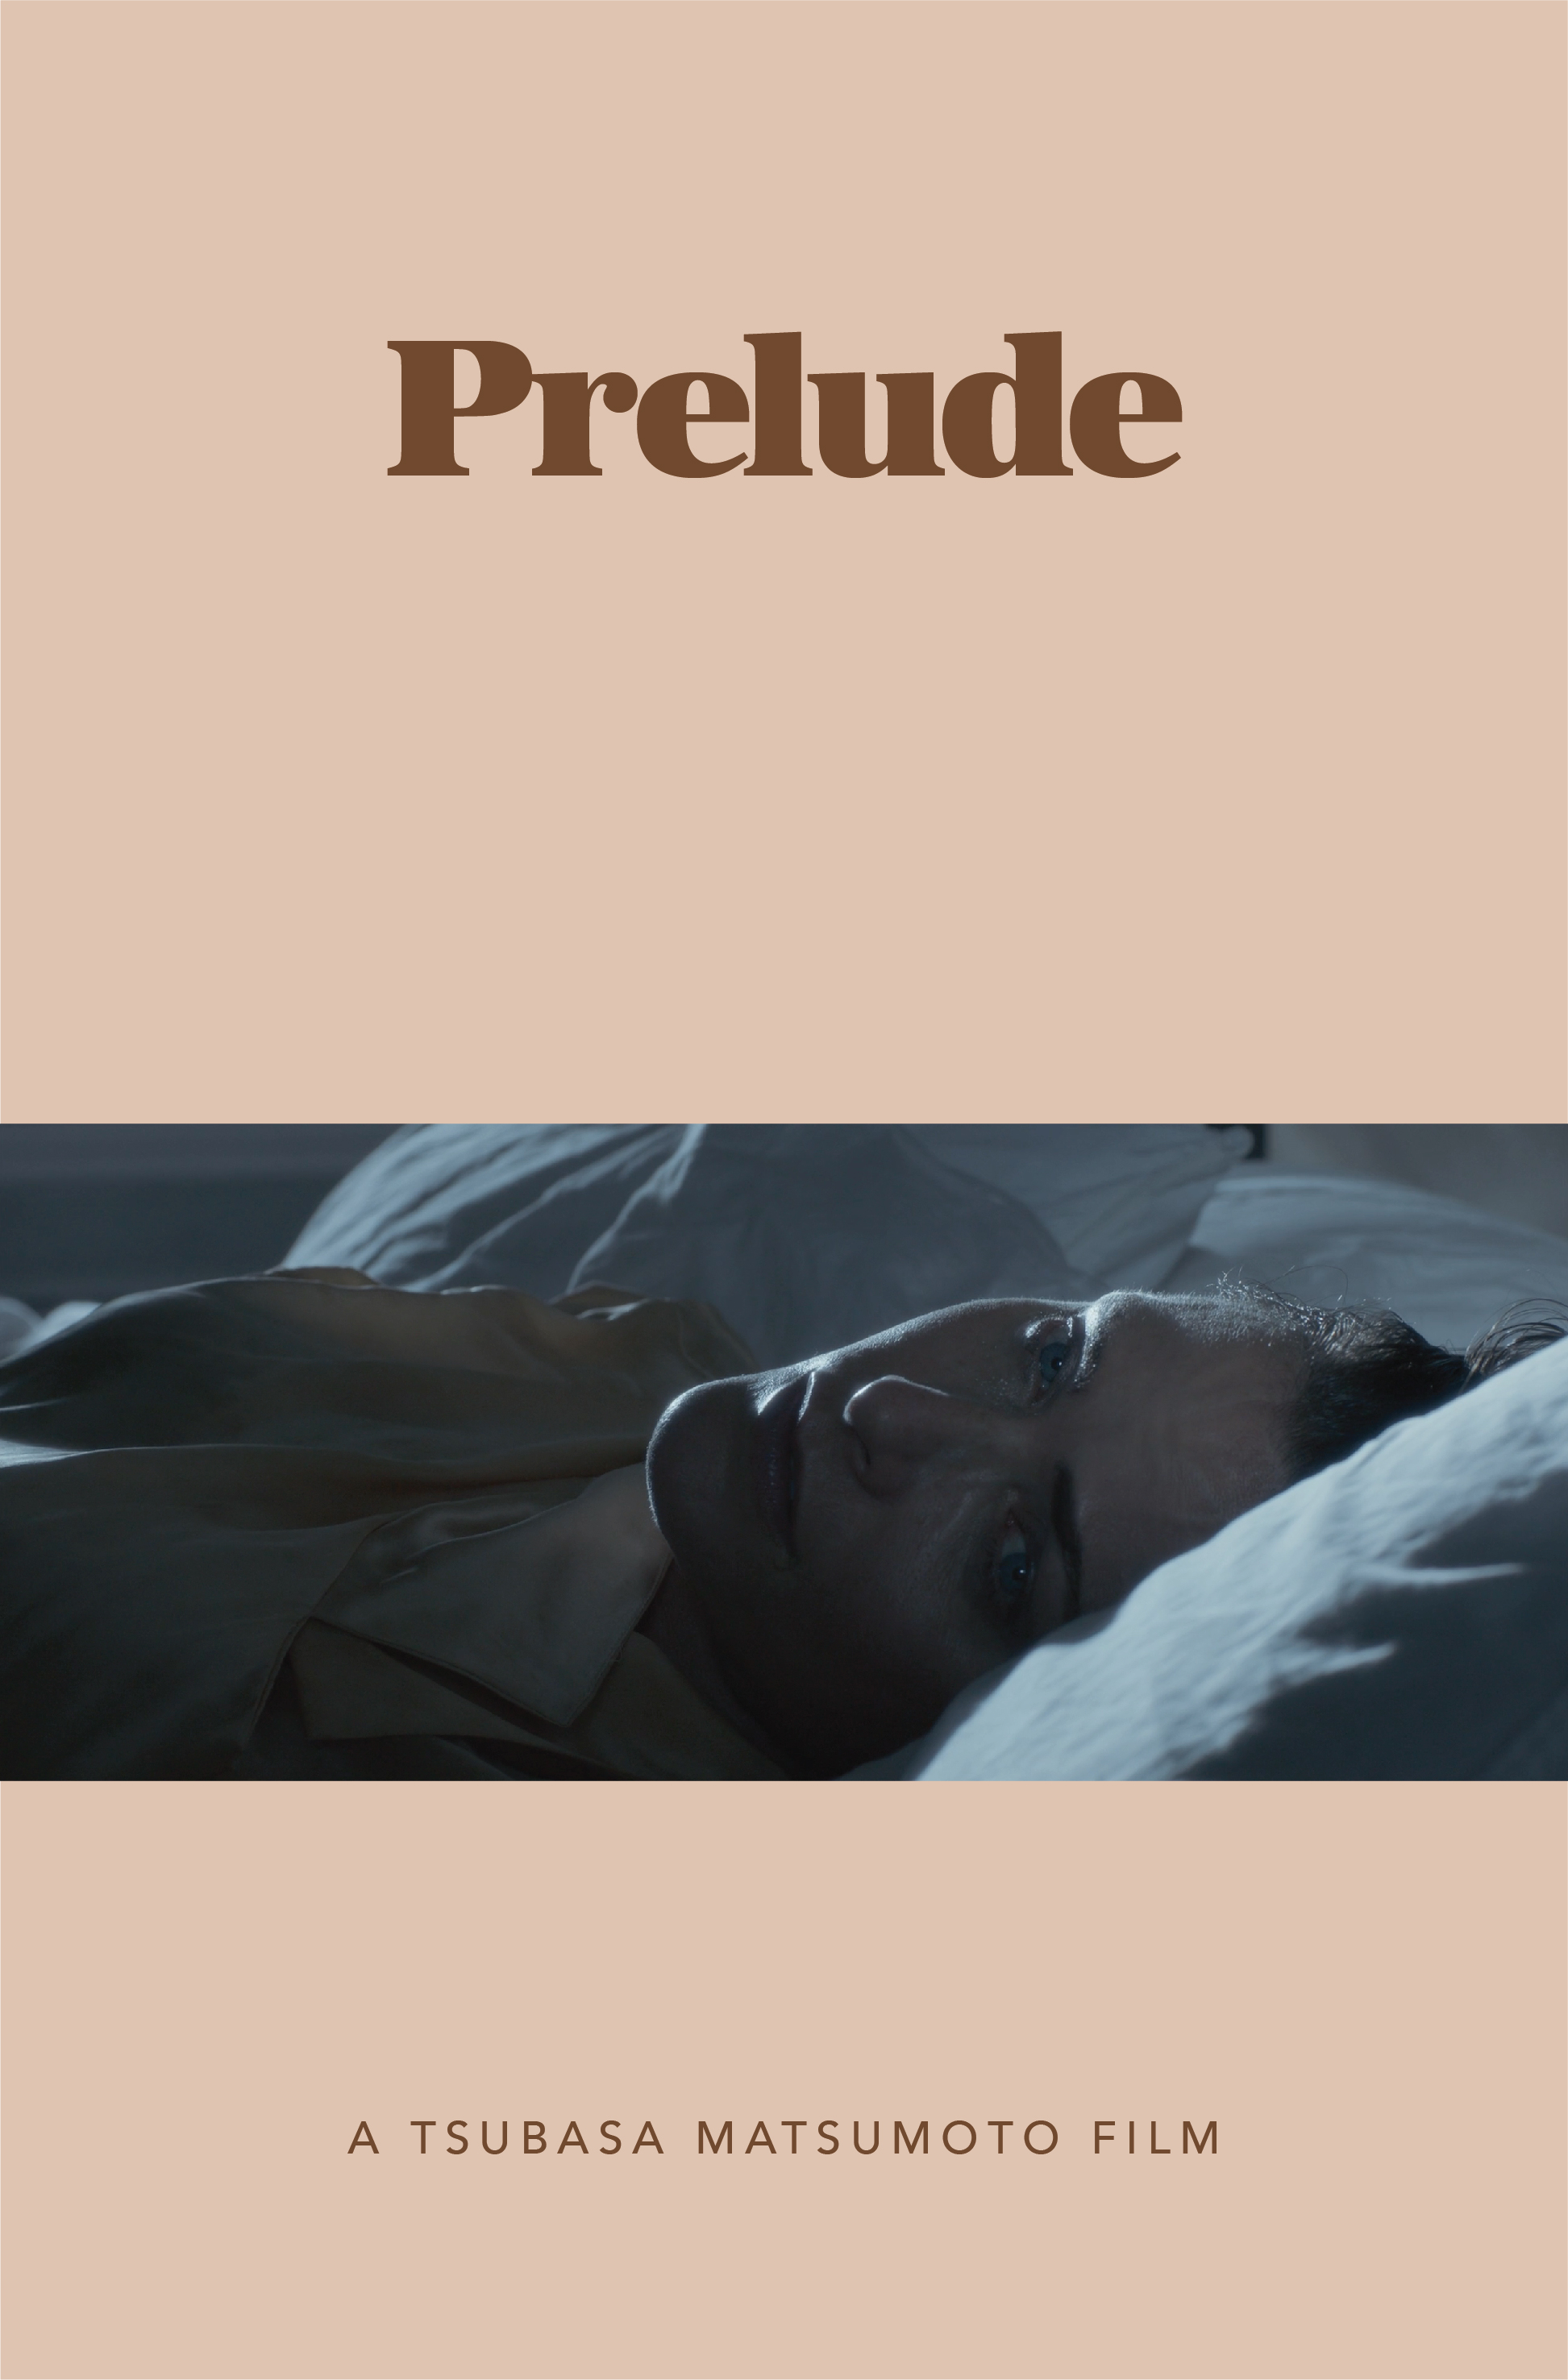 Prelude Character Series - Facebook Poster - FINAL-Kaitlin 2.jpg